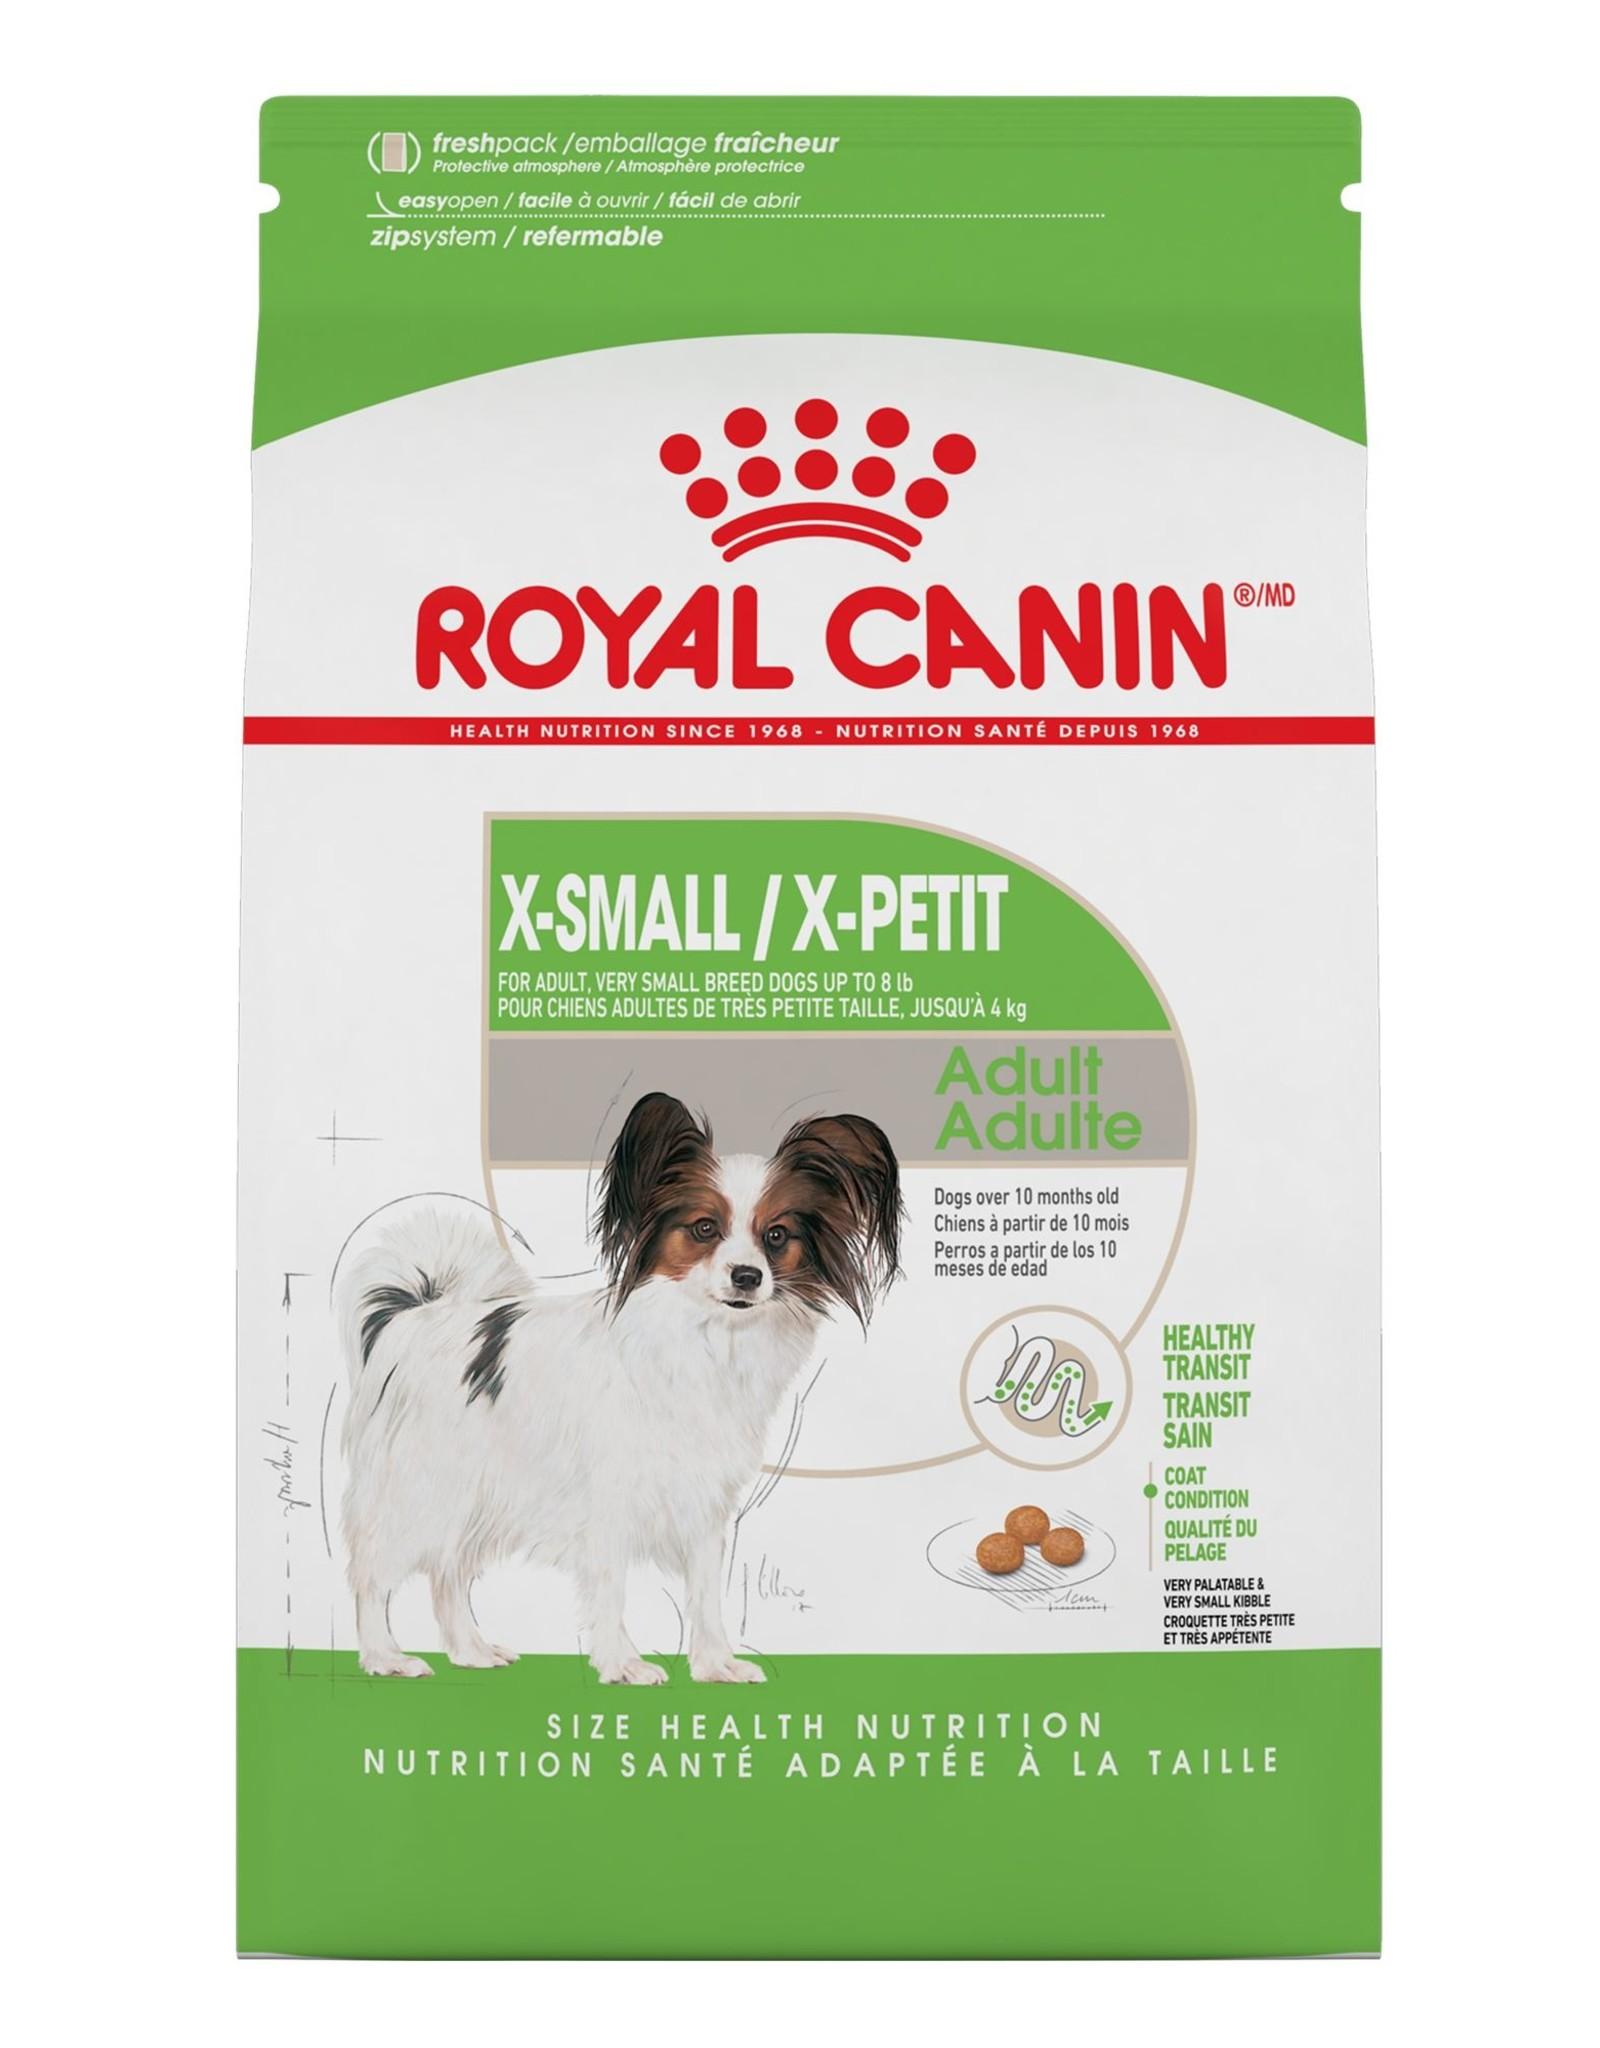 Royal Canin Royal Canin Dog X-Small 14lb